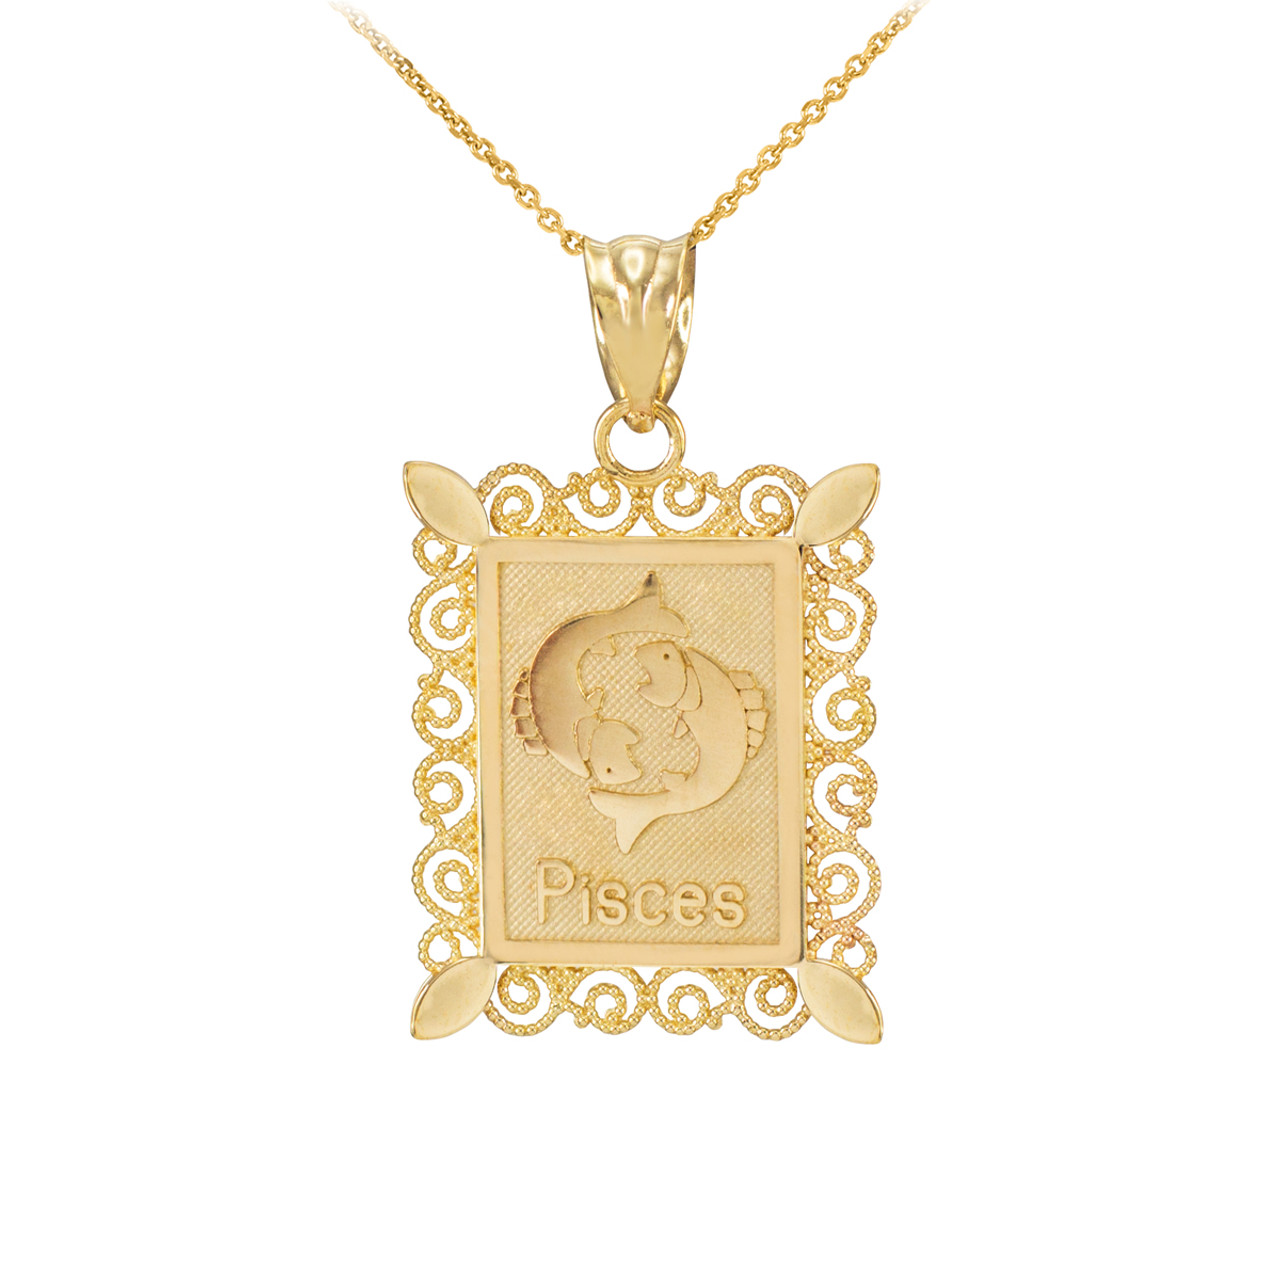 Polished gold rectangular pisces zodiac sign pendant gold pisces zodiac sign filigree square pendant necklace mozeypictures Choice Image